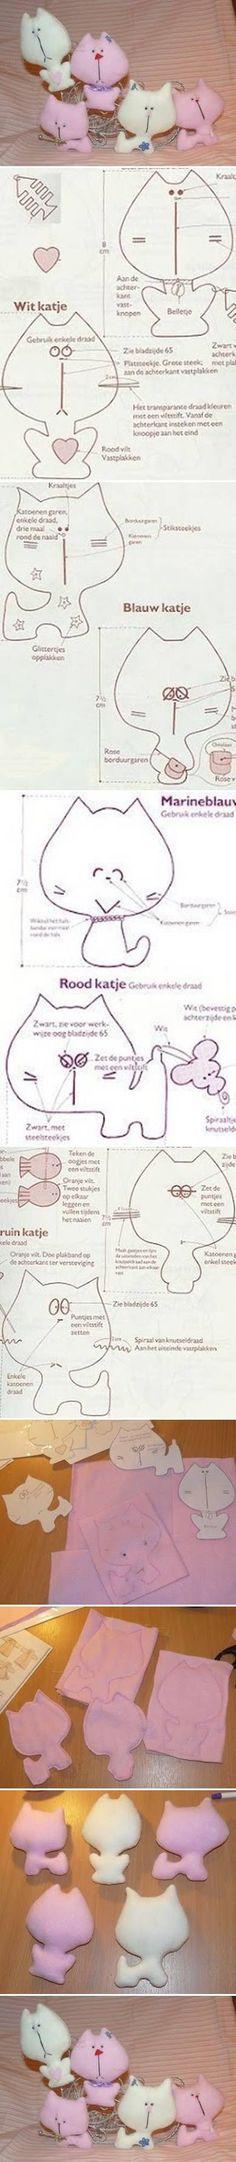 DIY Cute Little Fabric Cats